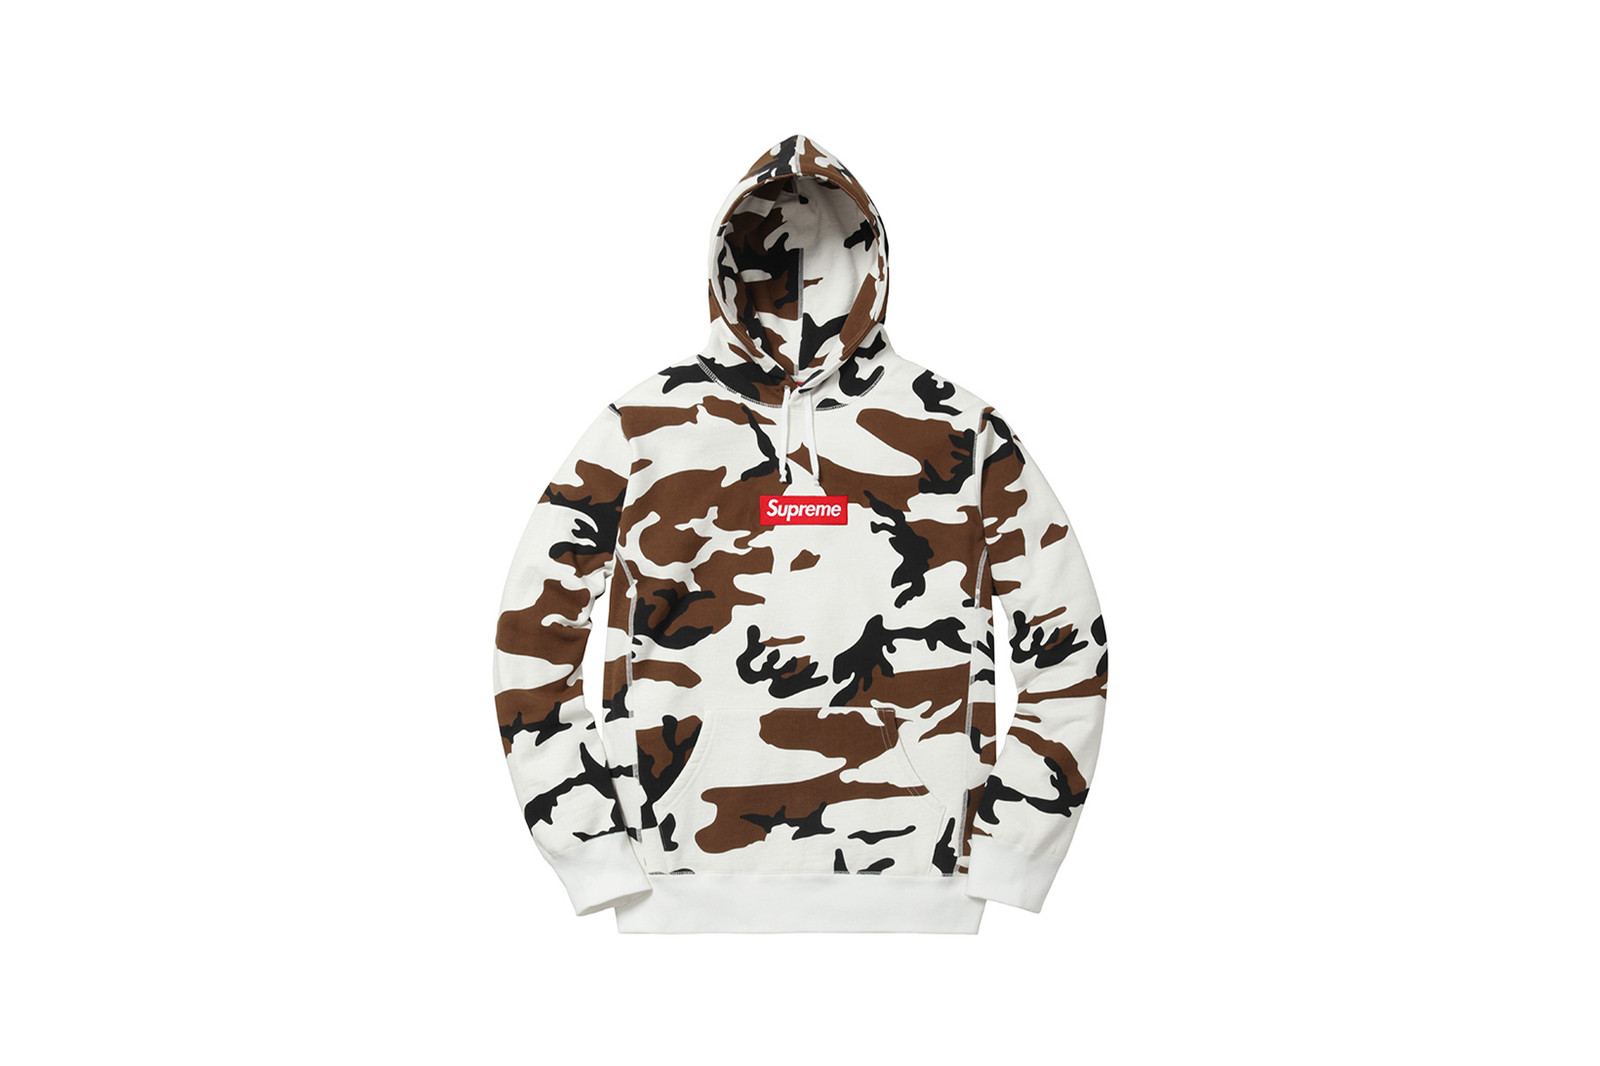 supreme-shuts-down-nyc-sign-up-box-logo-hoodies-0